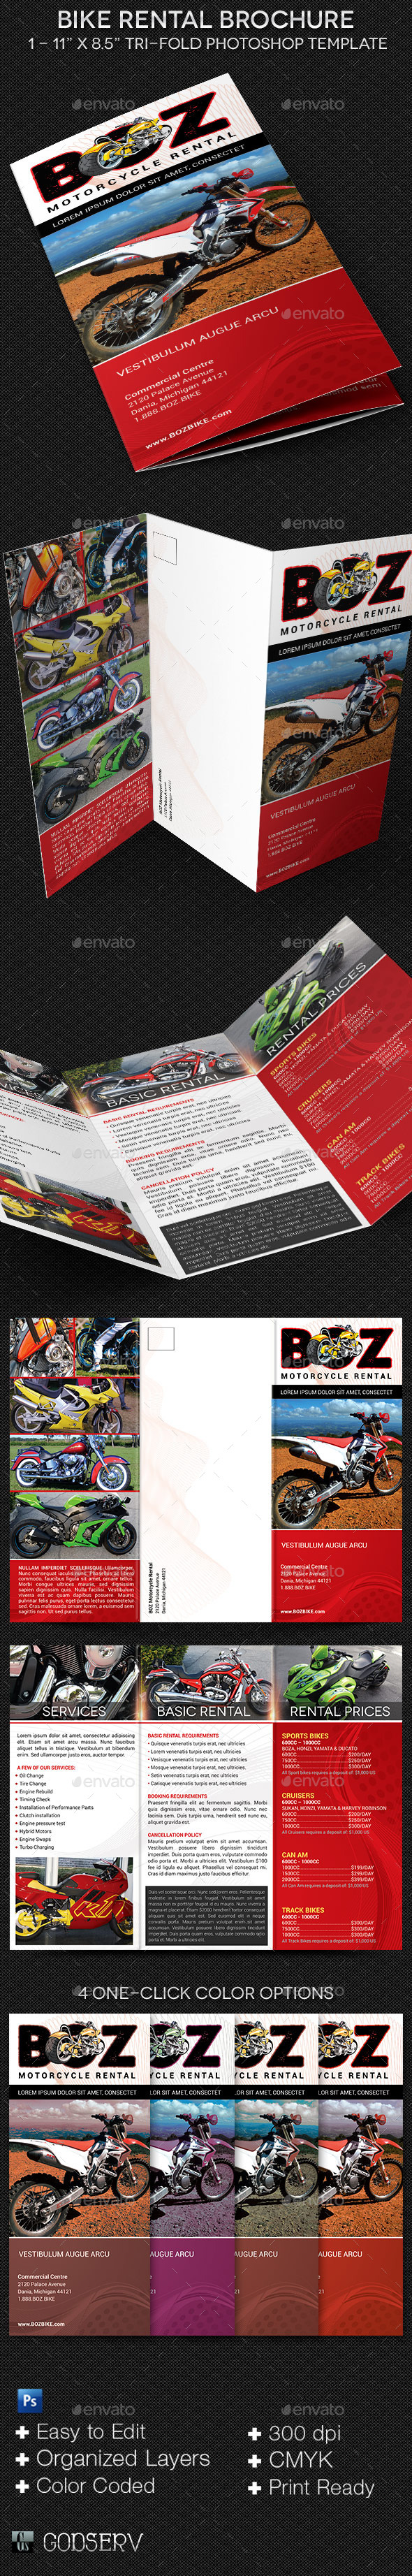 Bike Rental Brochure Template - Informational Brochures